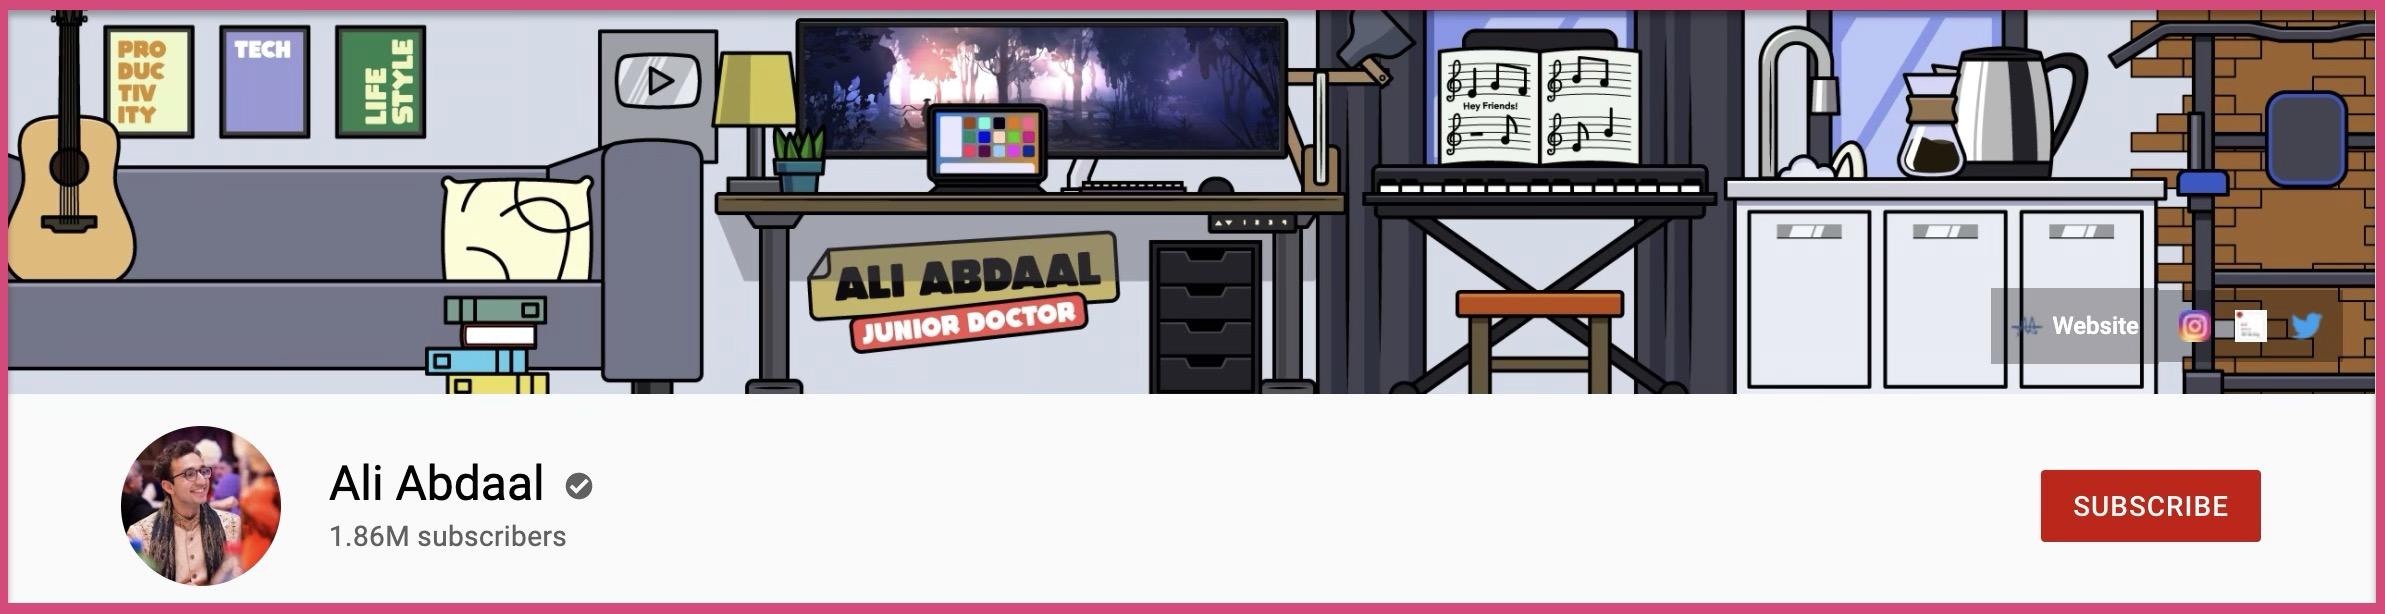 Ali Abdaal's YouTube channel art